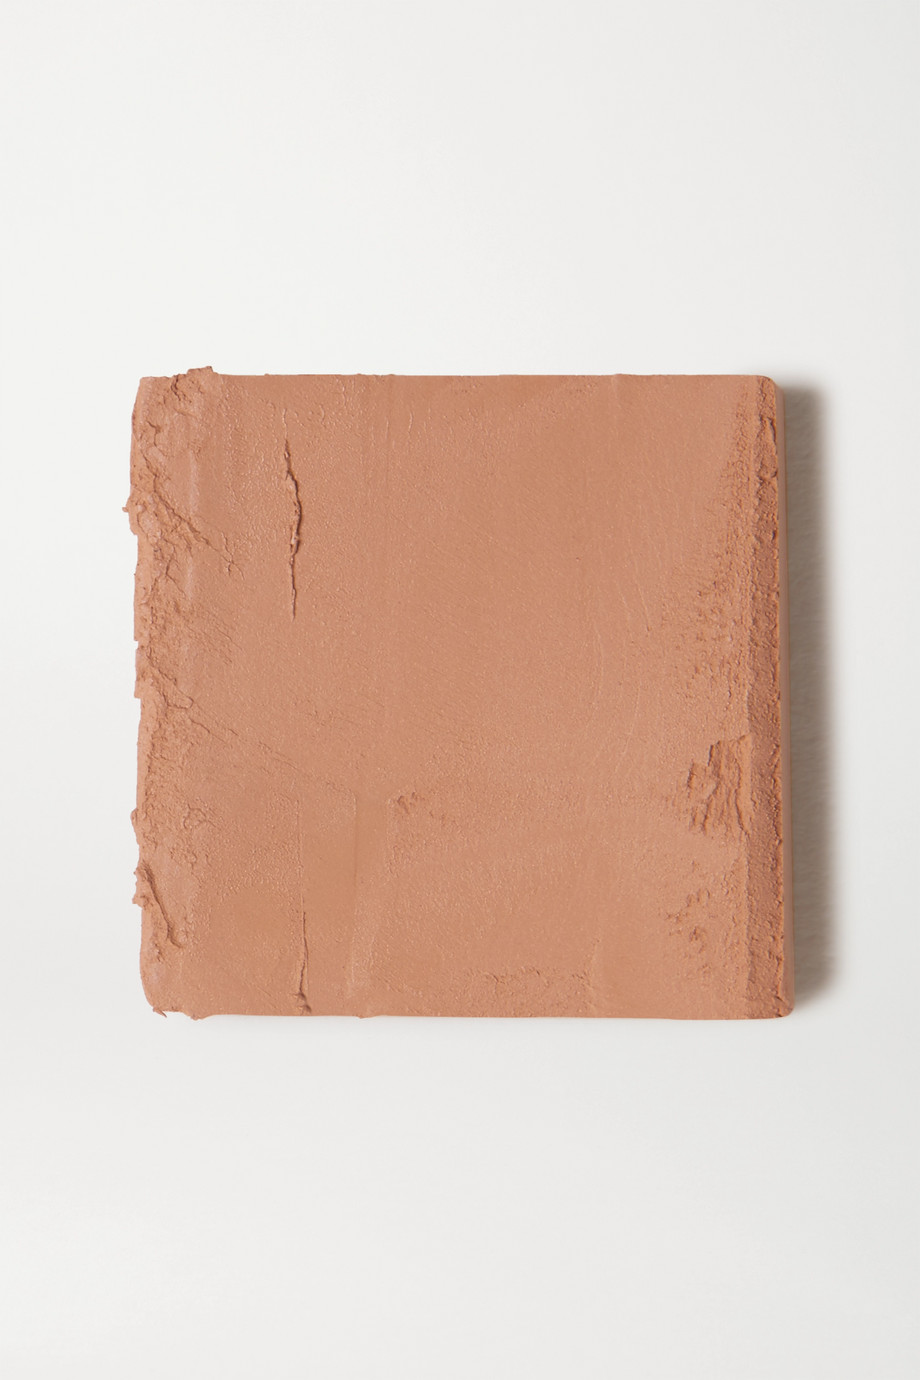 Huda Beauty #FauxFilter Skin Finish Foundation Stick – Tres Leches 320G – Foundation-Stick